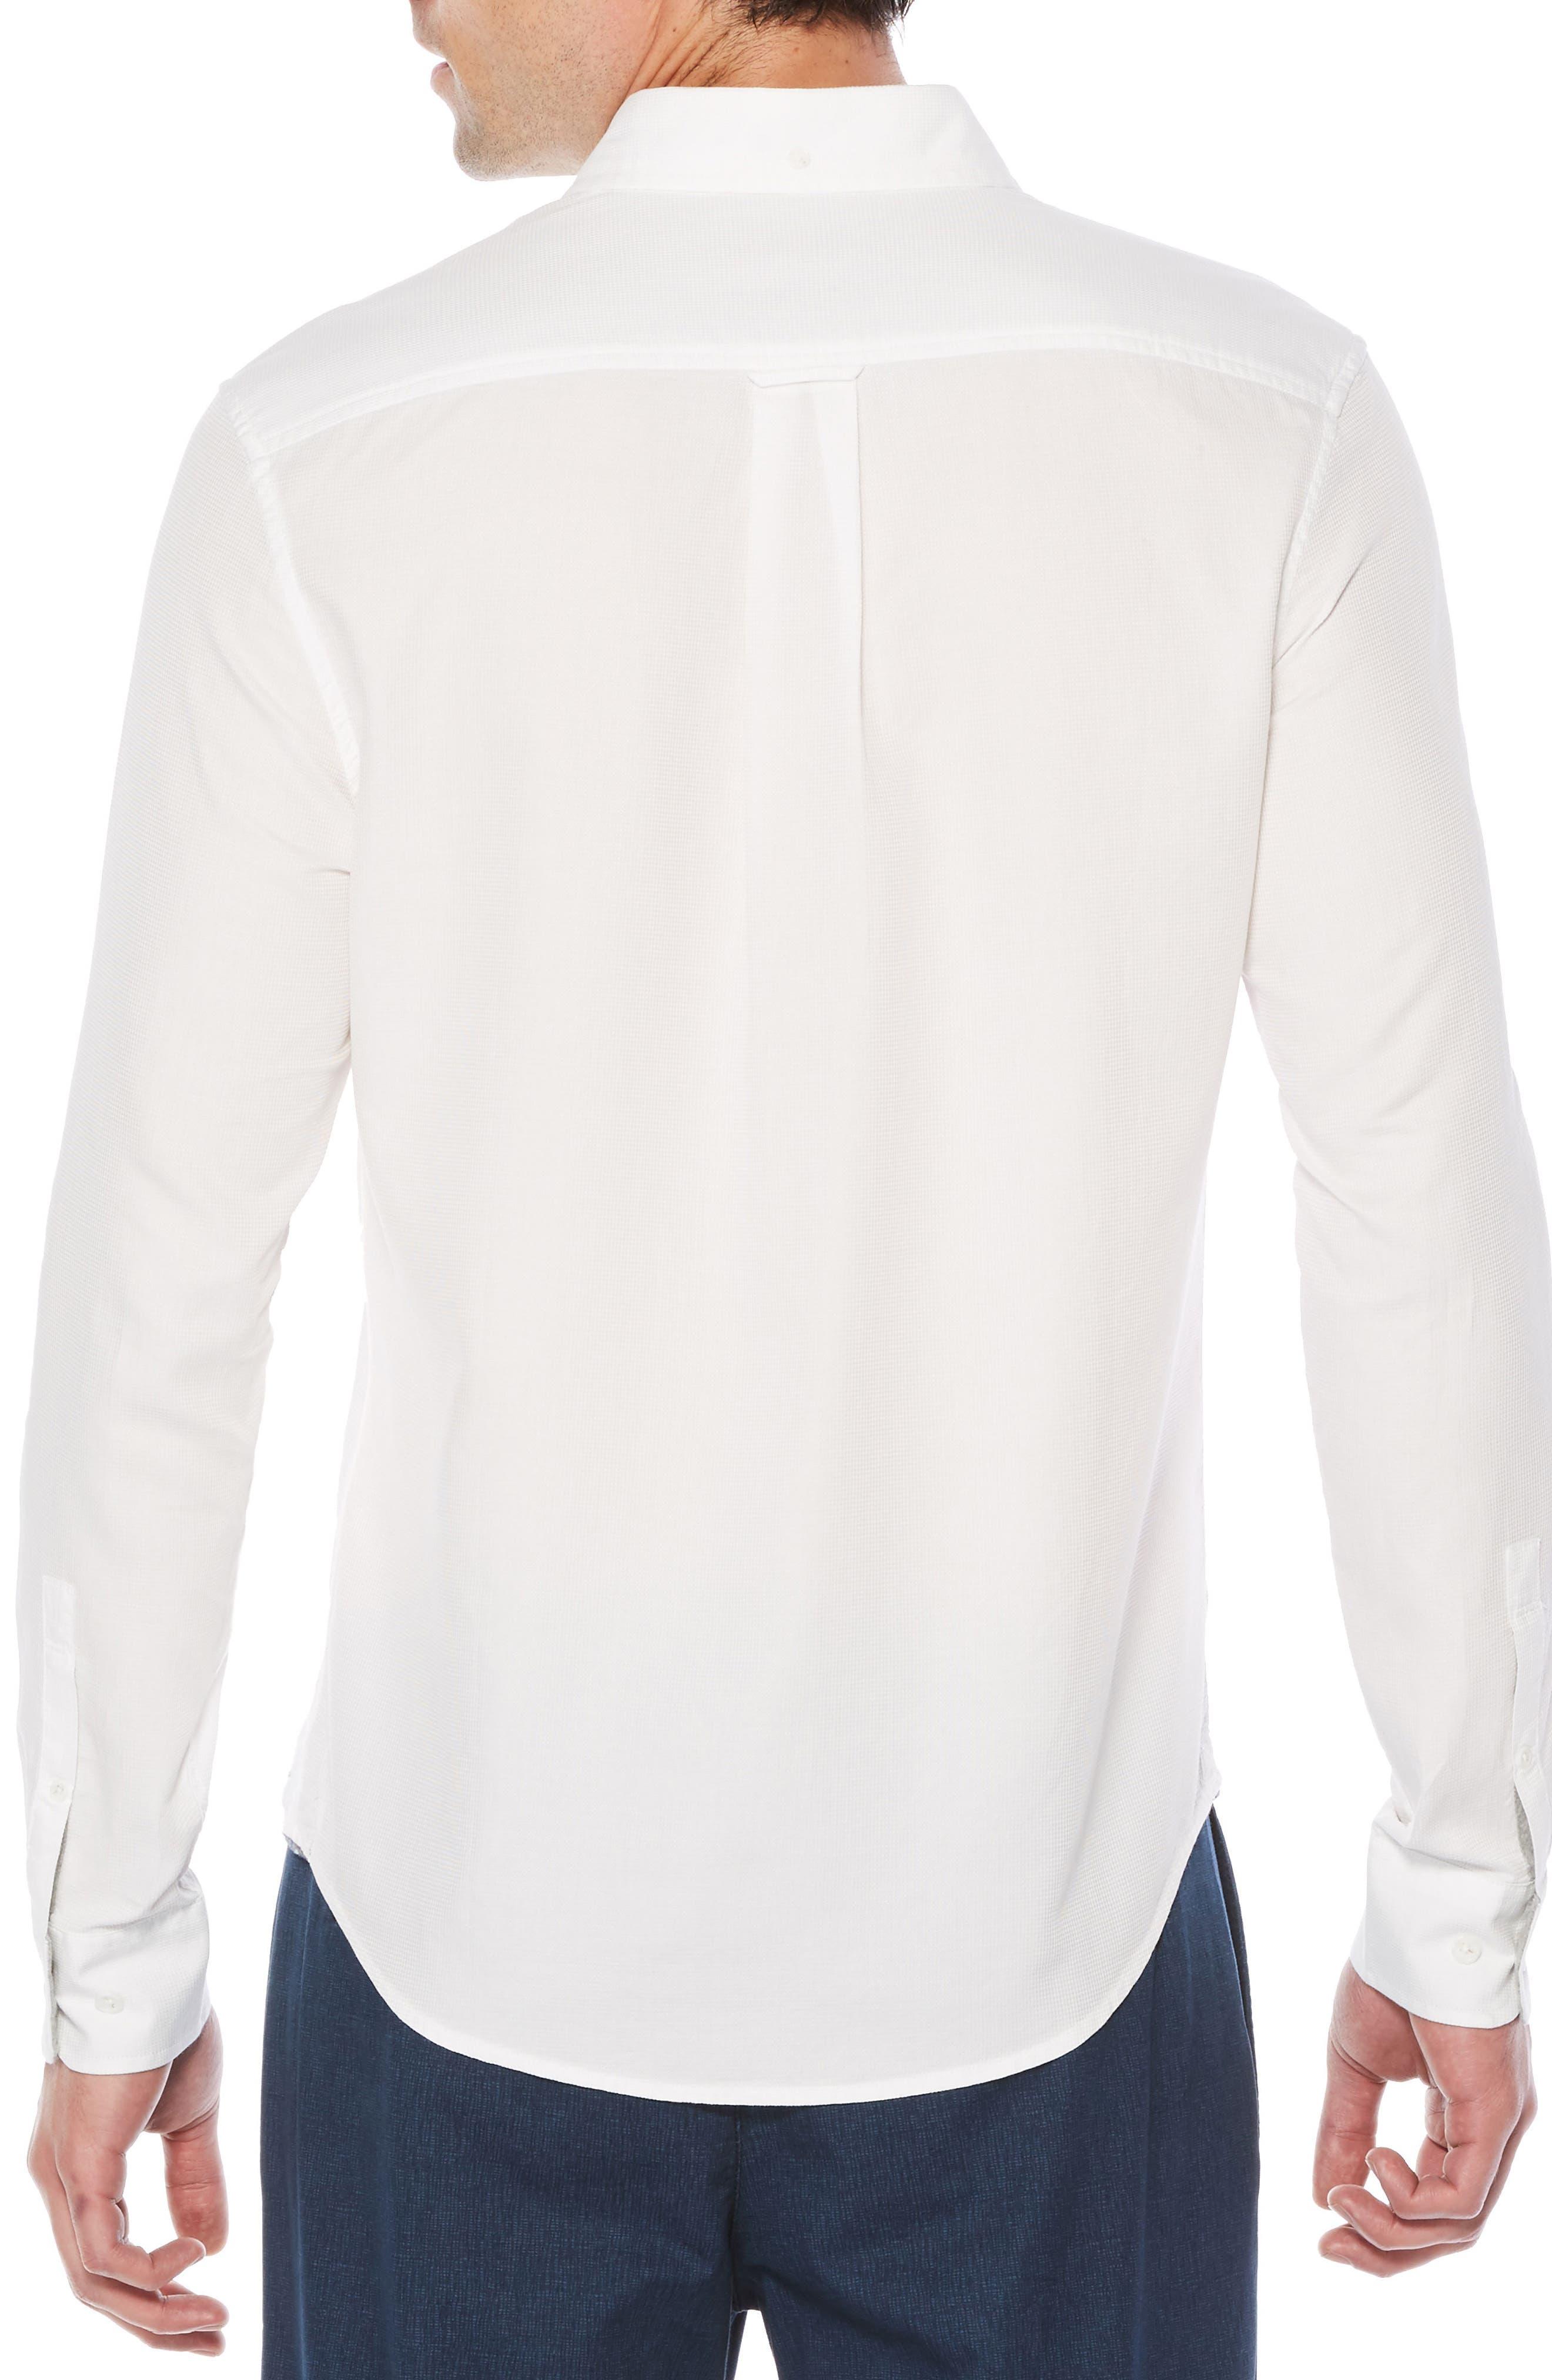 Woven Shirt,                             Alternate thumbnail 2, color,                             Bright White